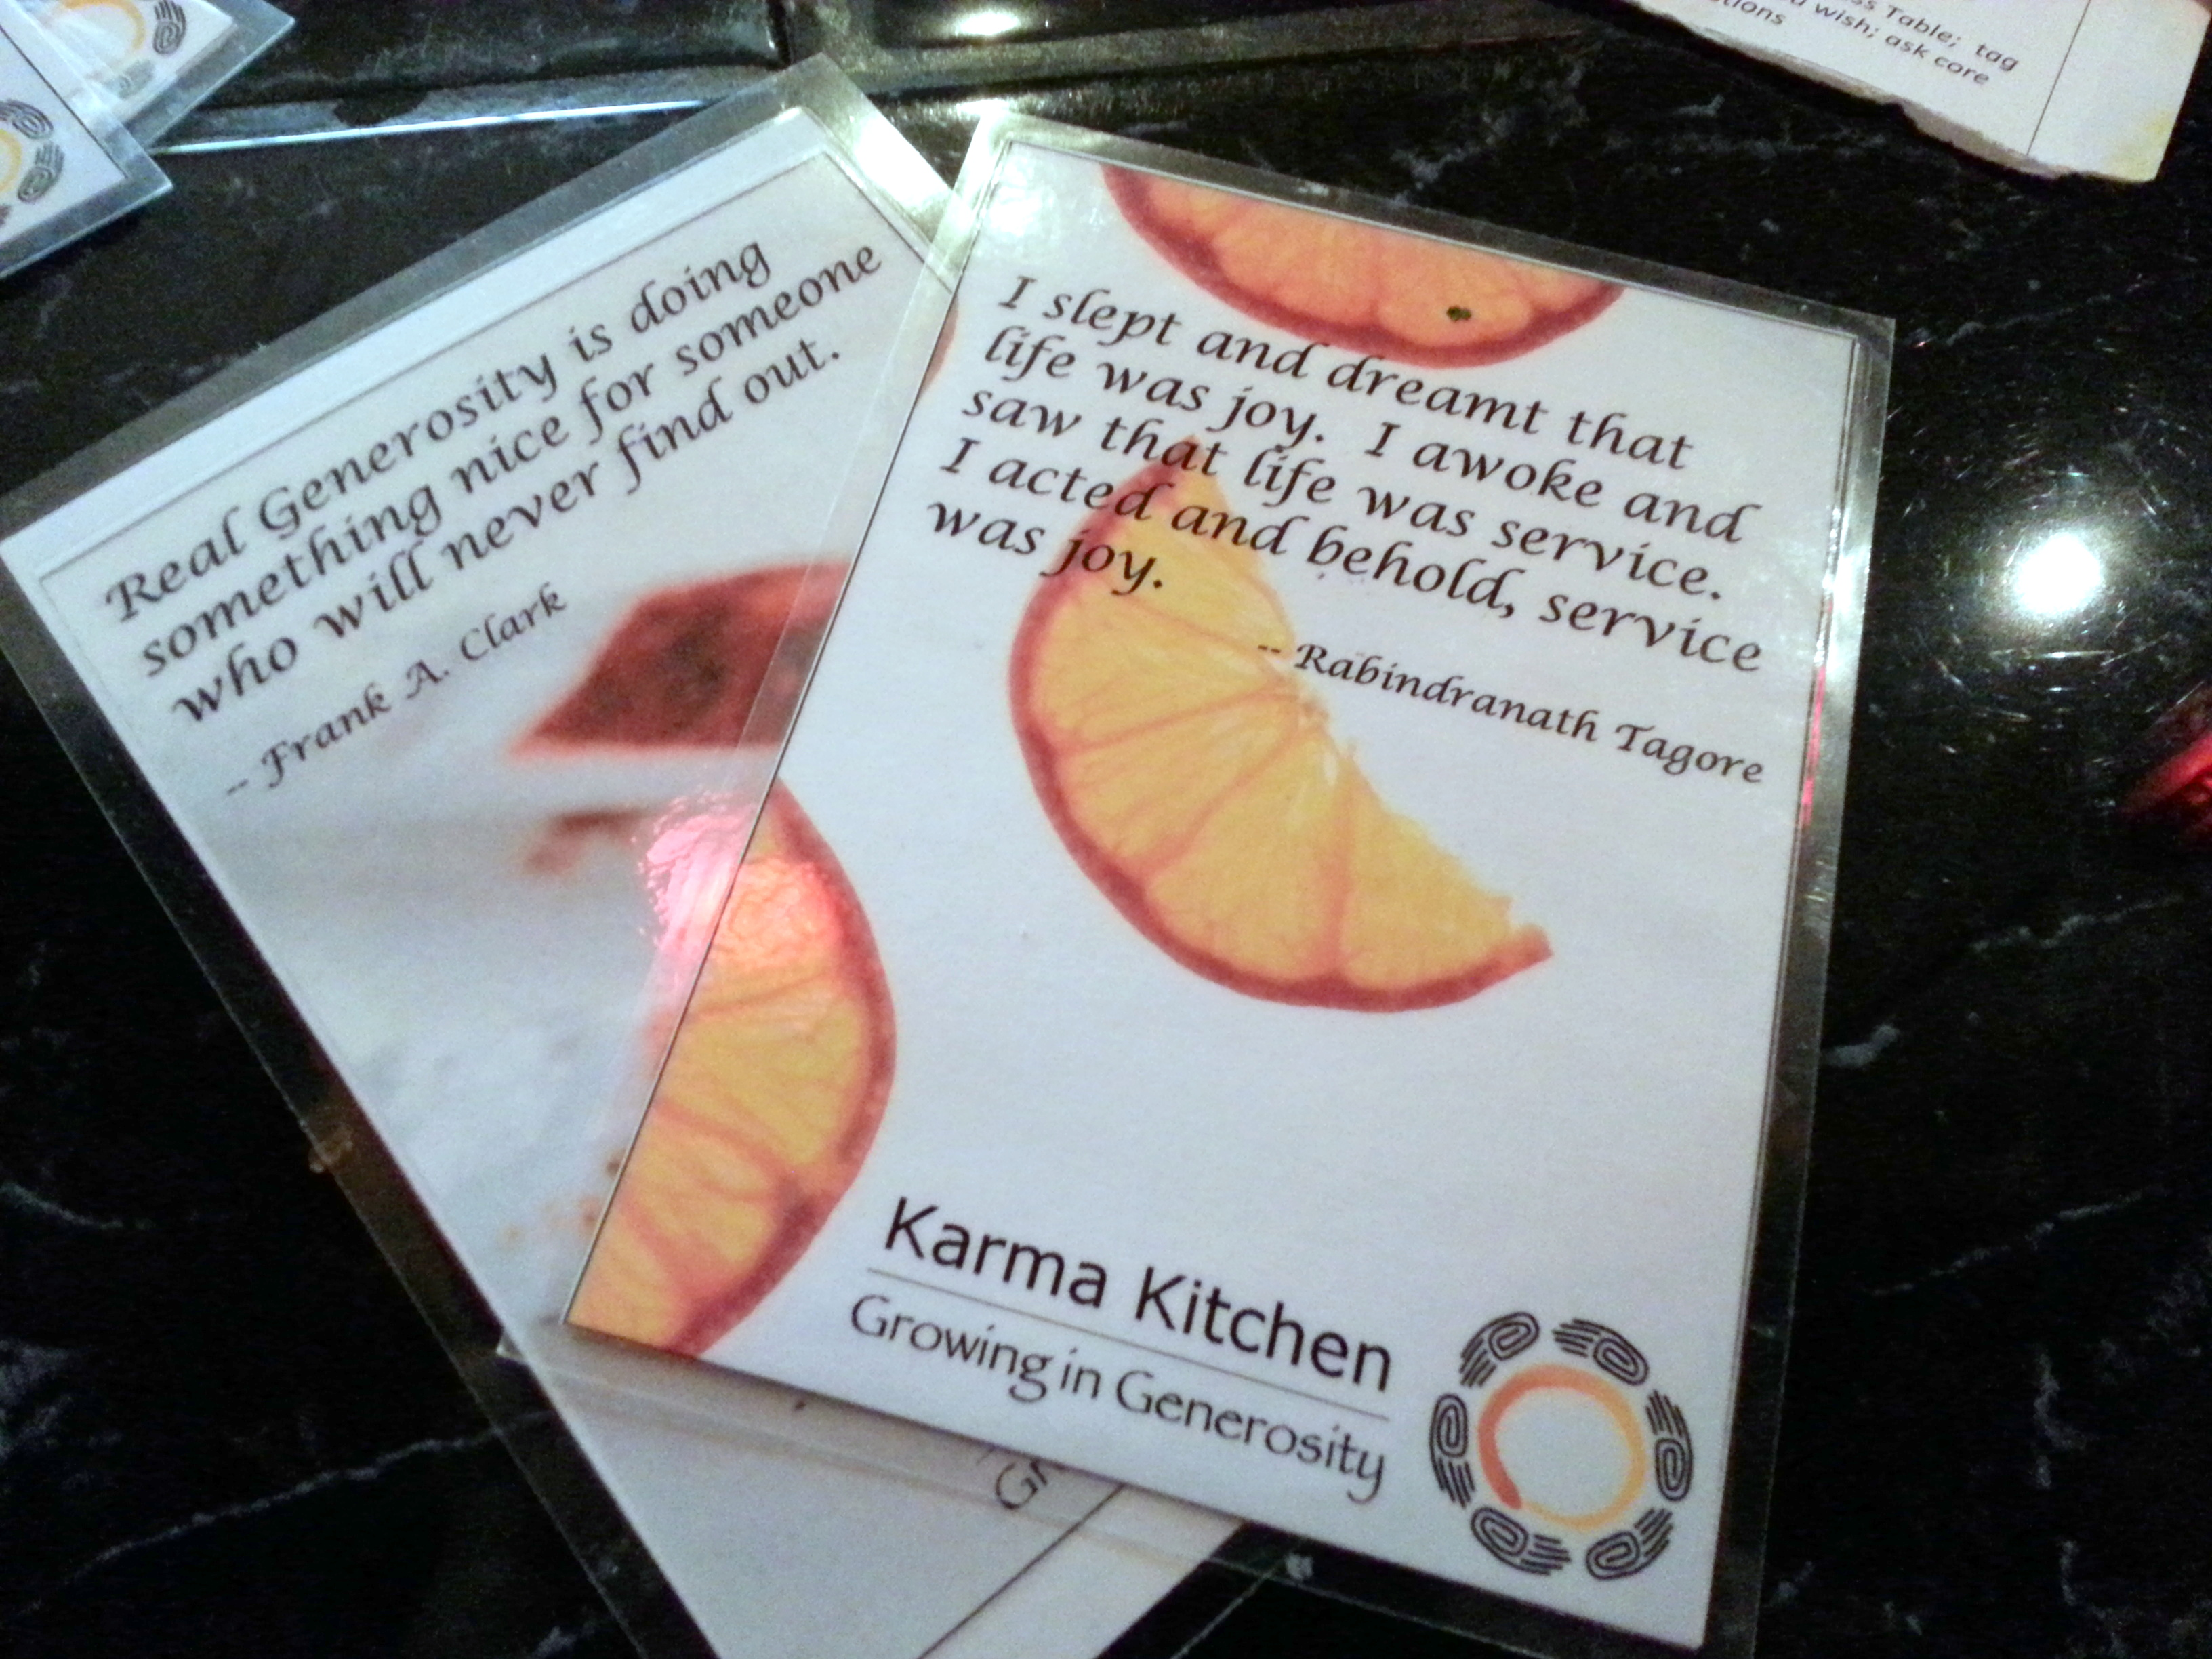 Karma Kitchen - Growing in Generosity